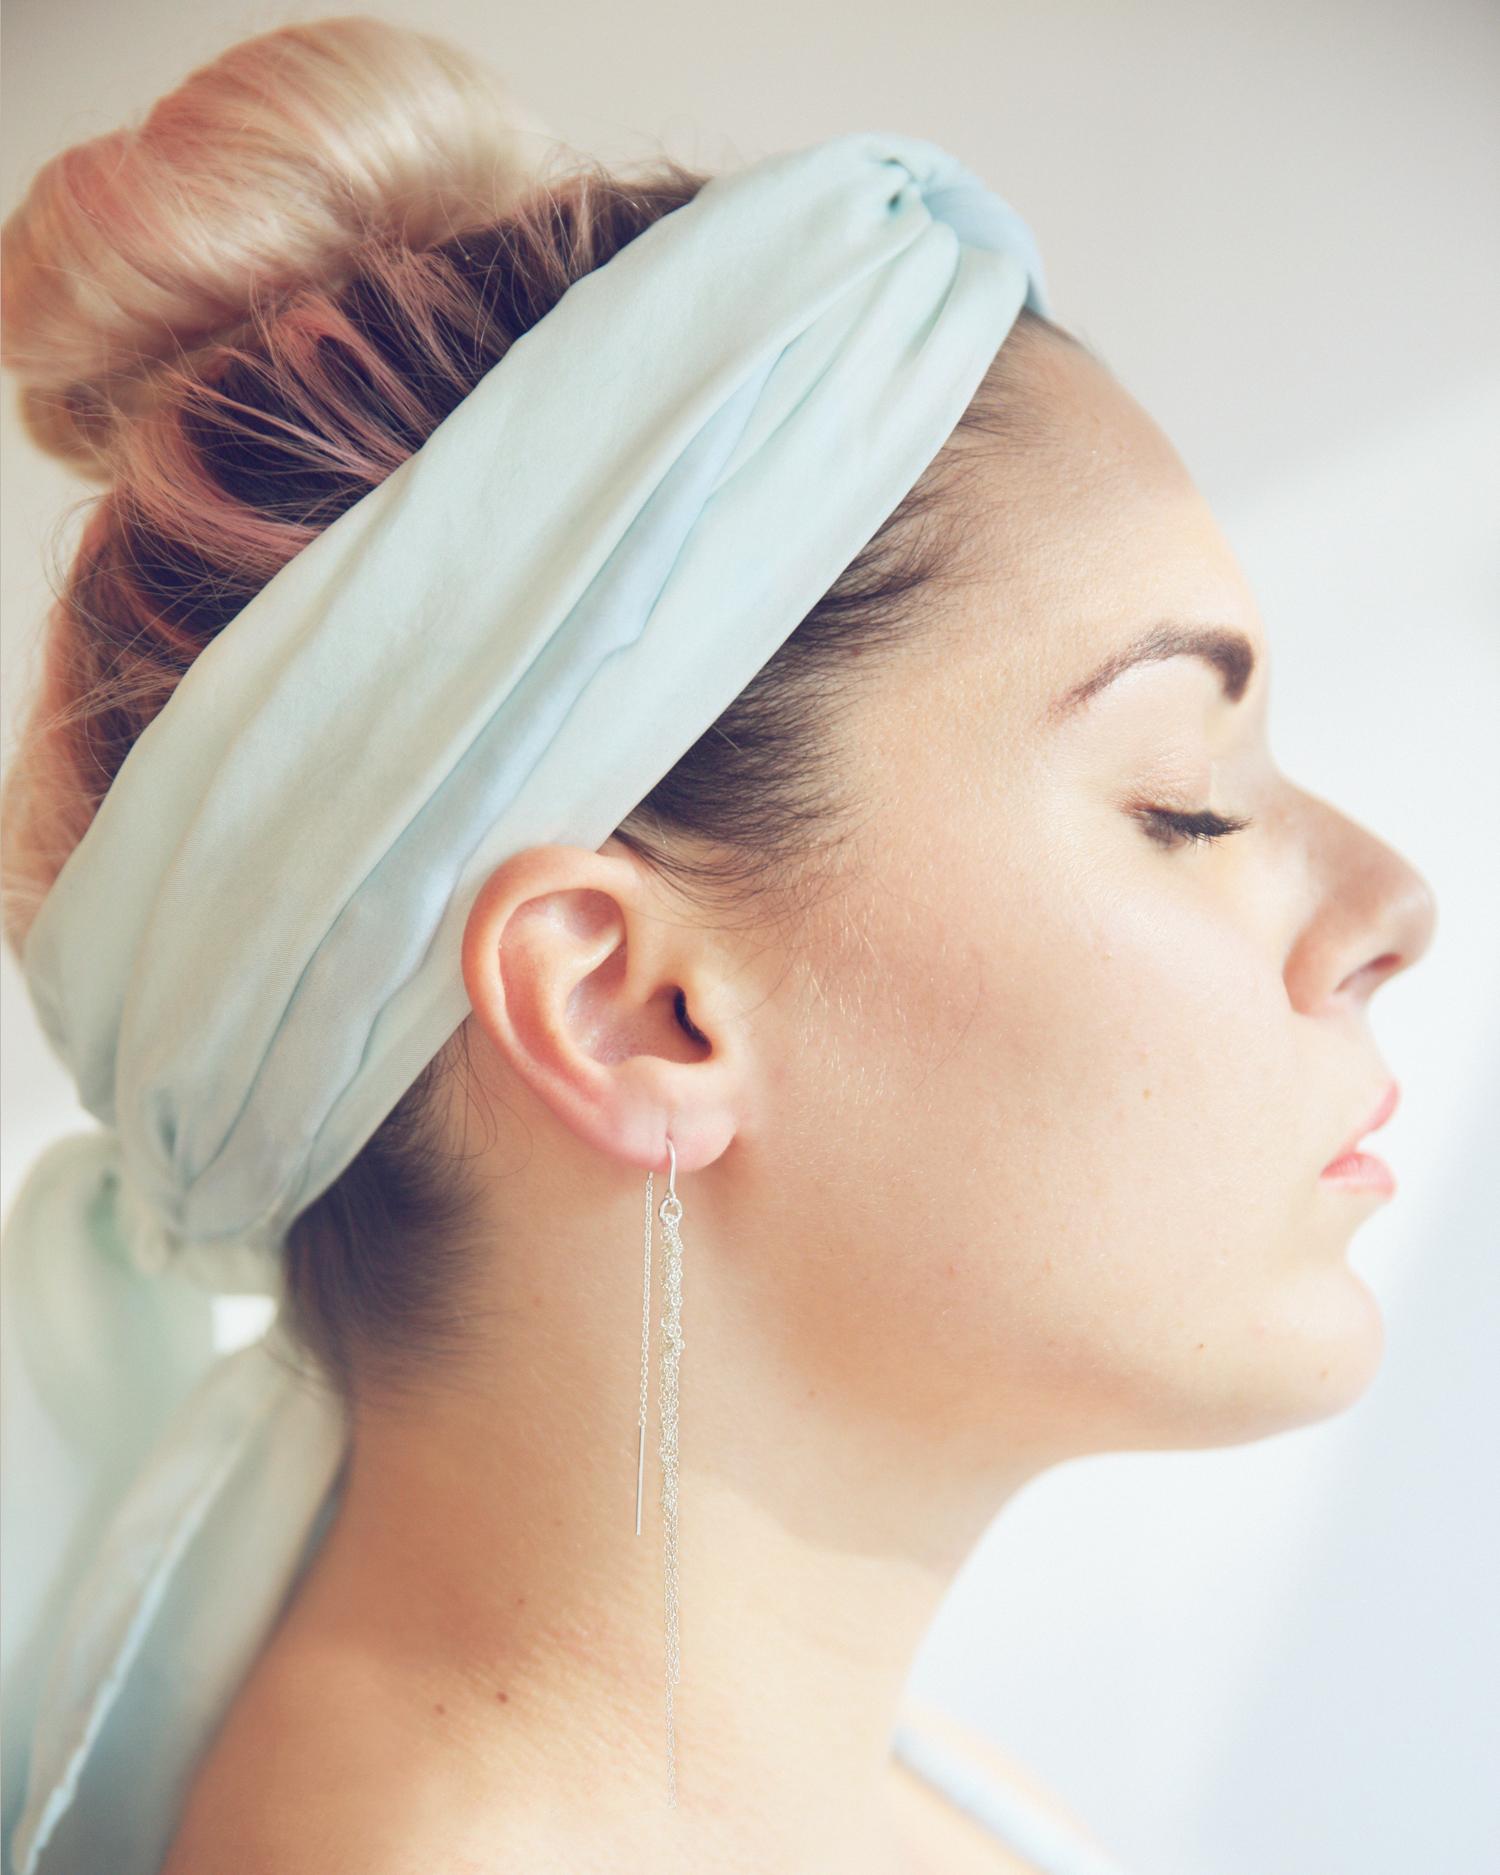 earring06.jpg